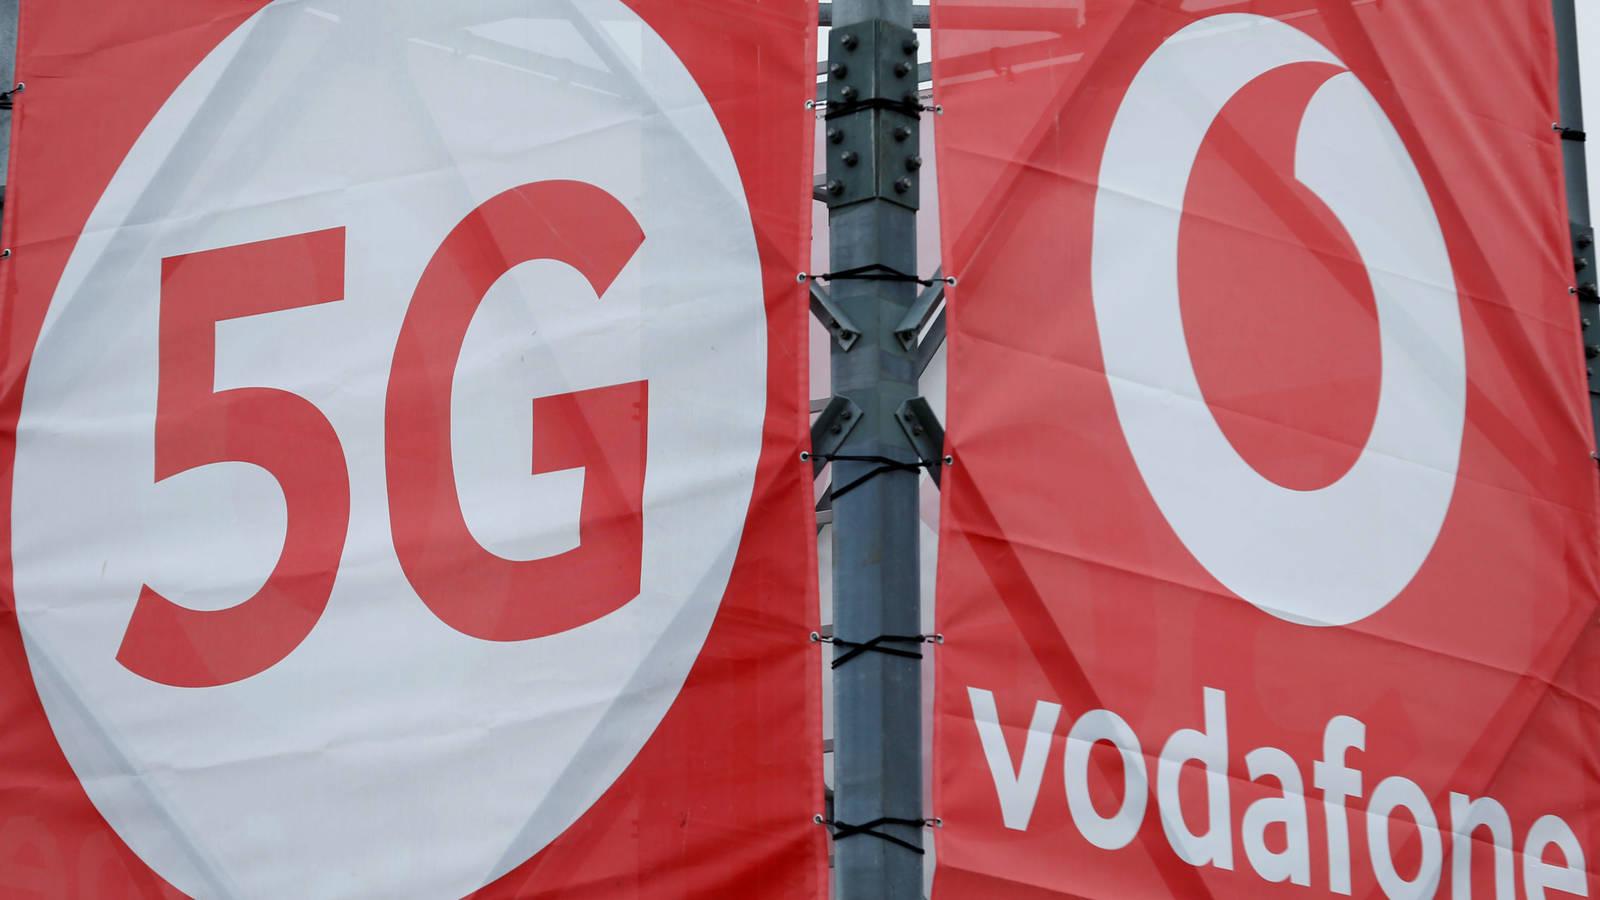 Vodafone estrena red 5G con Huawei